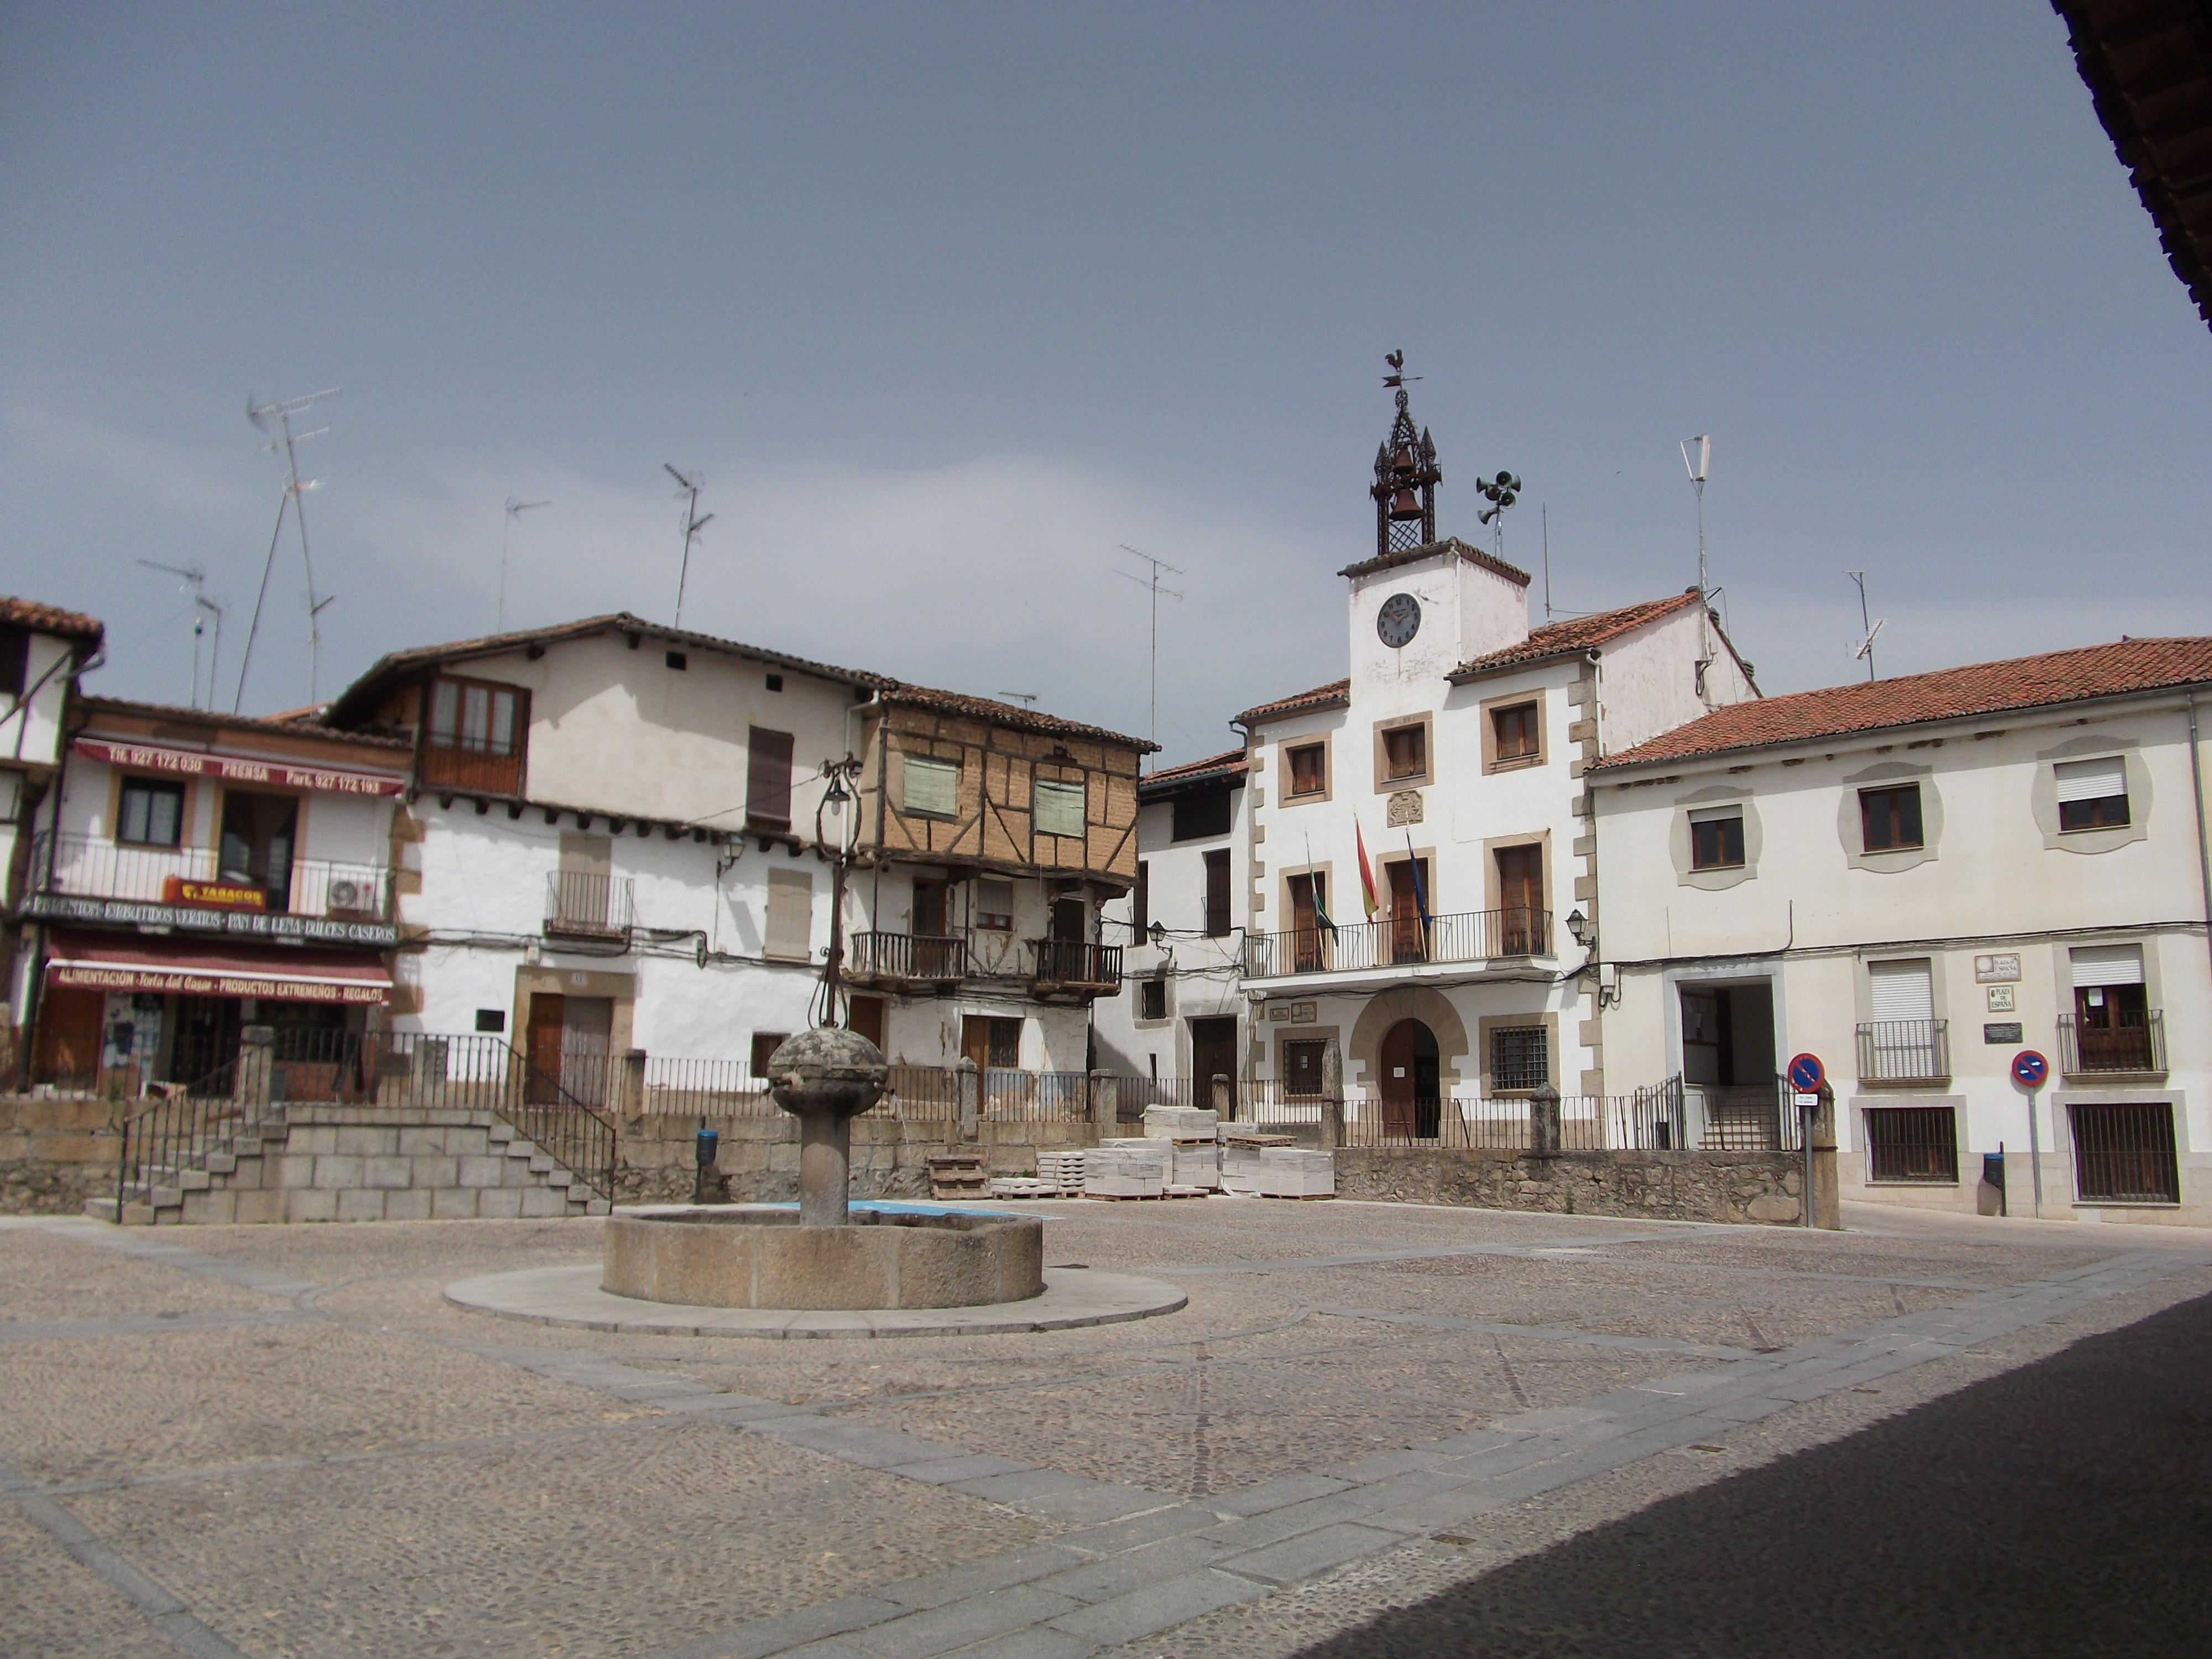 The town square at Cuacos de Yuste.